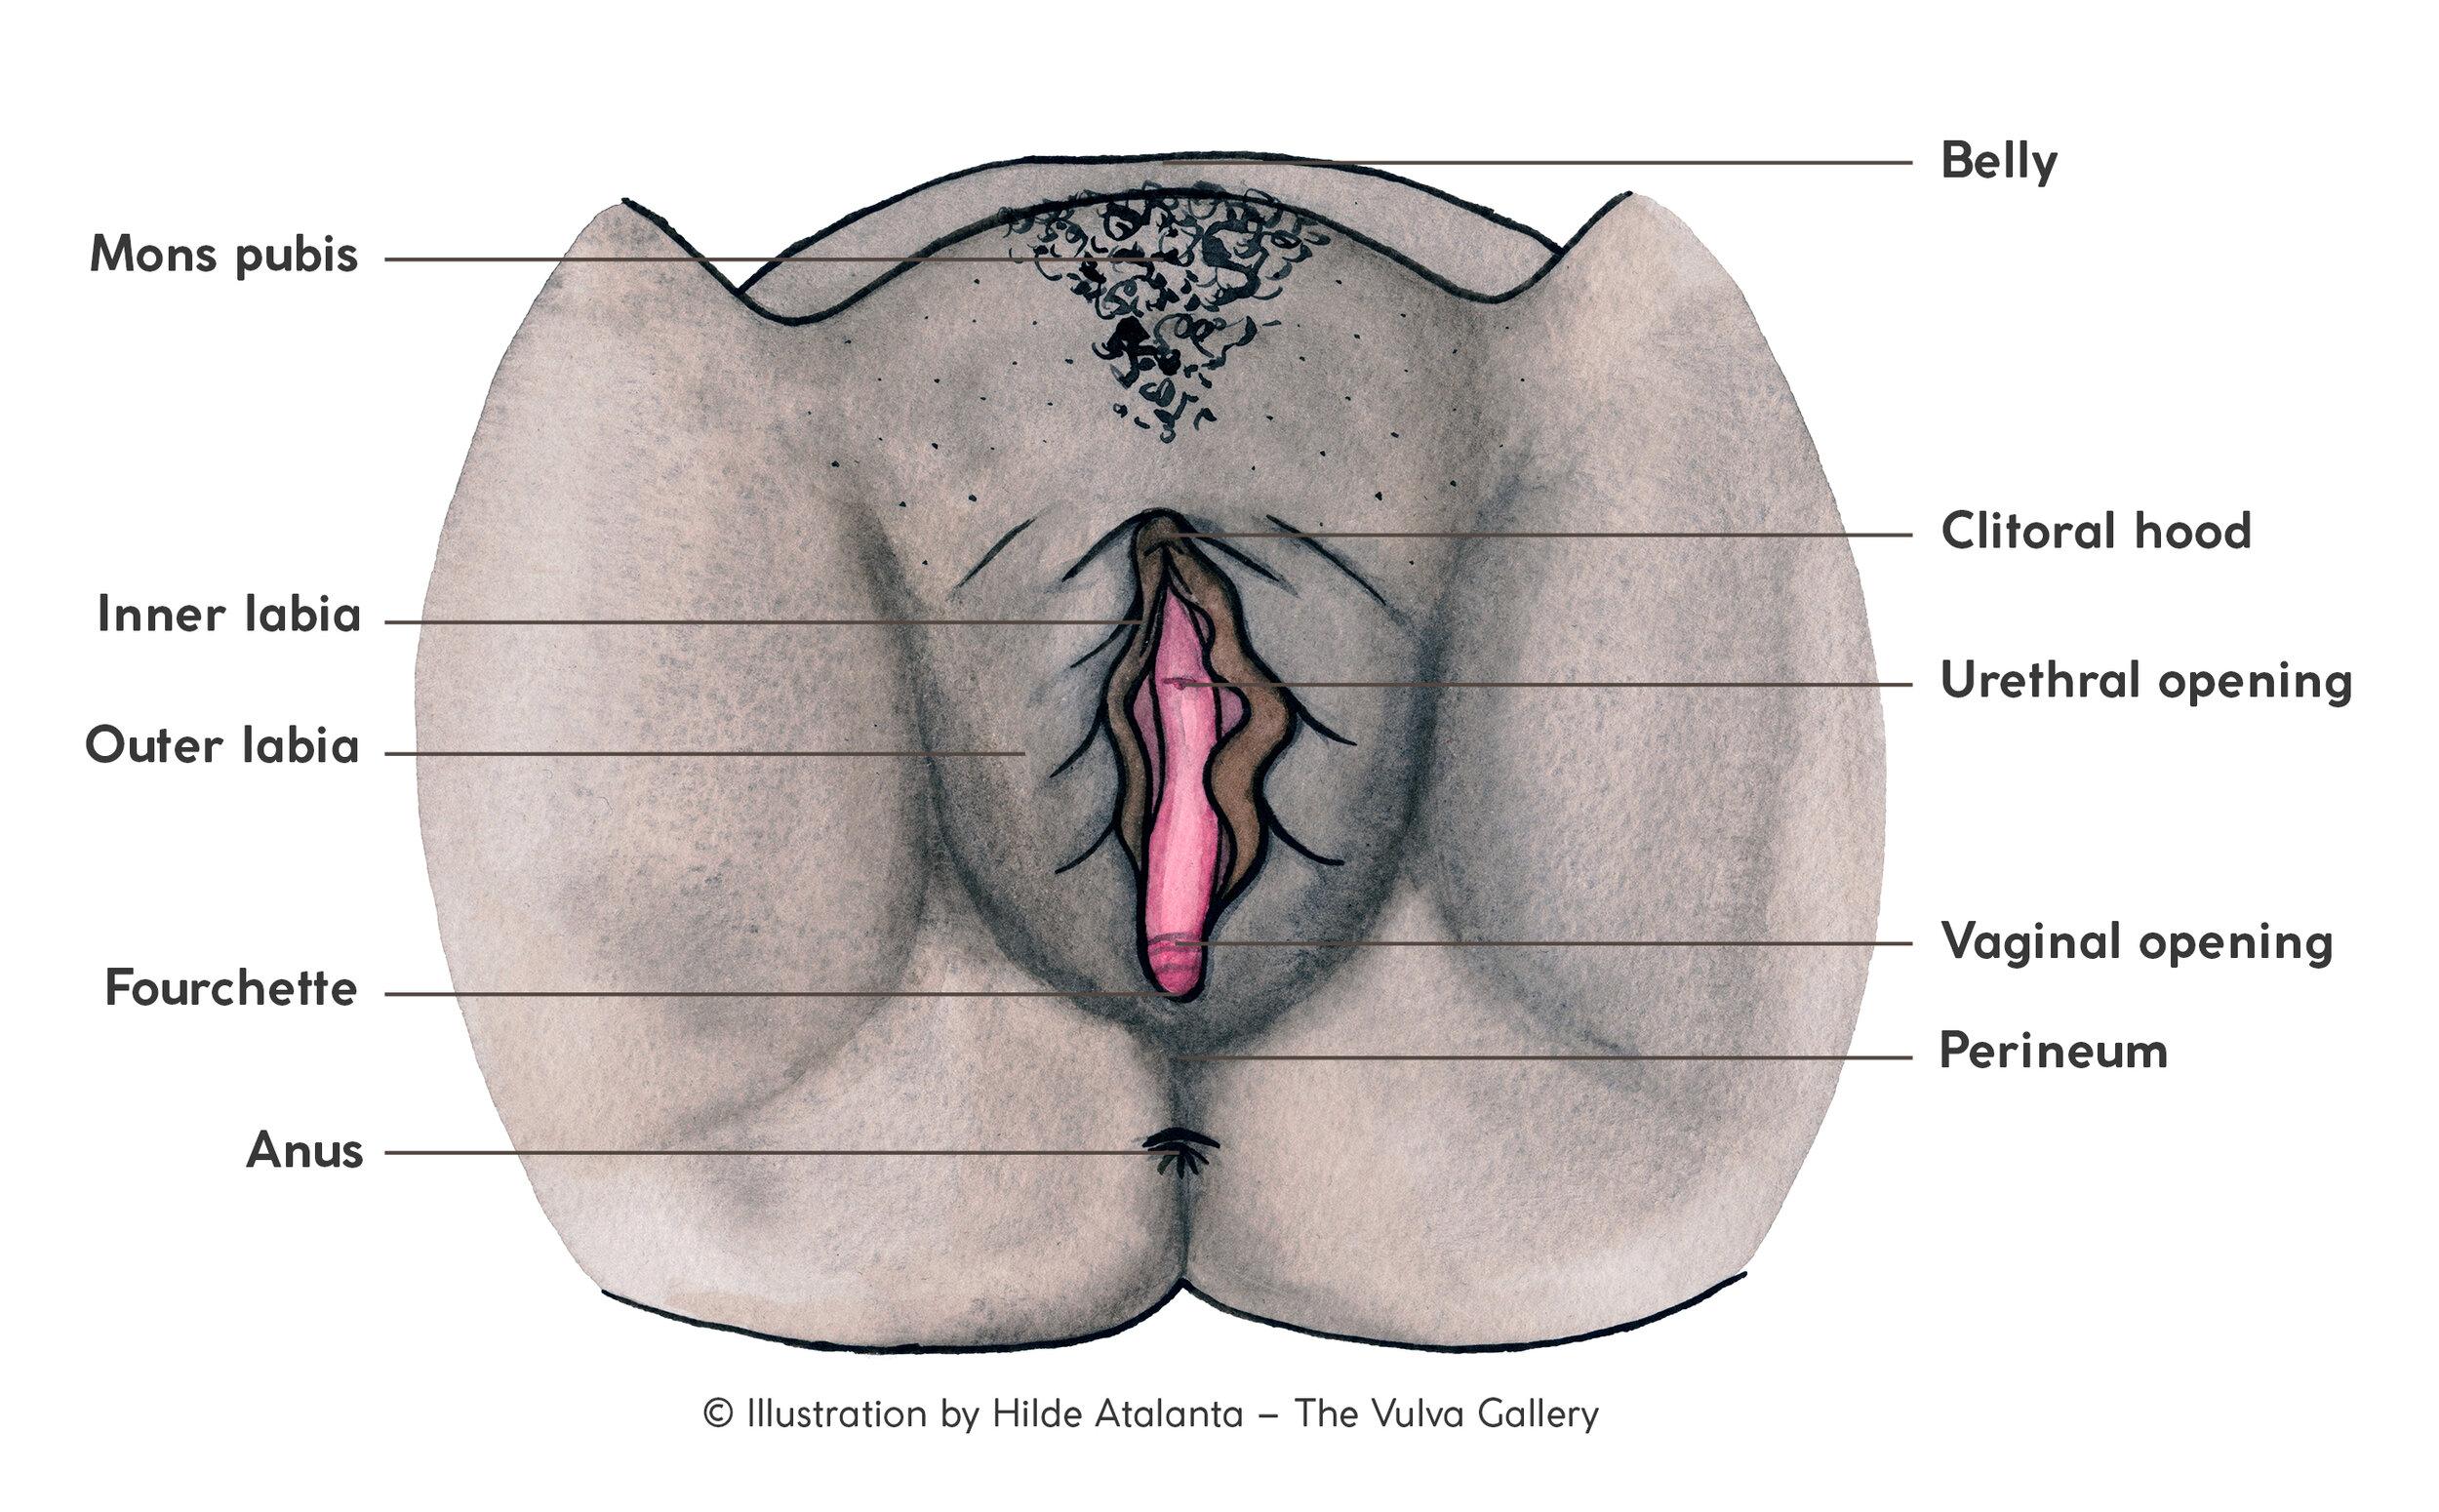 The vulva and vagina